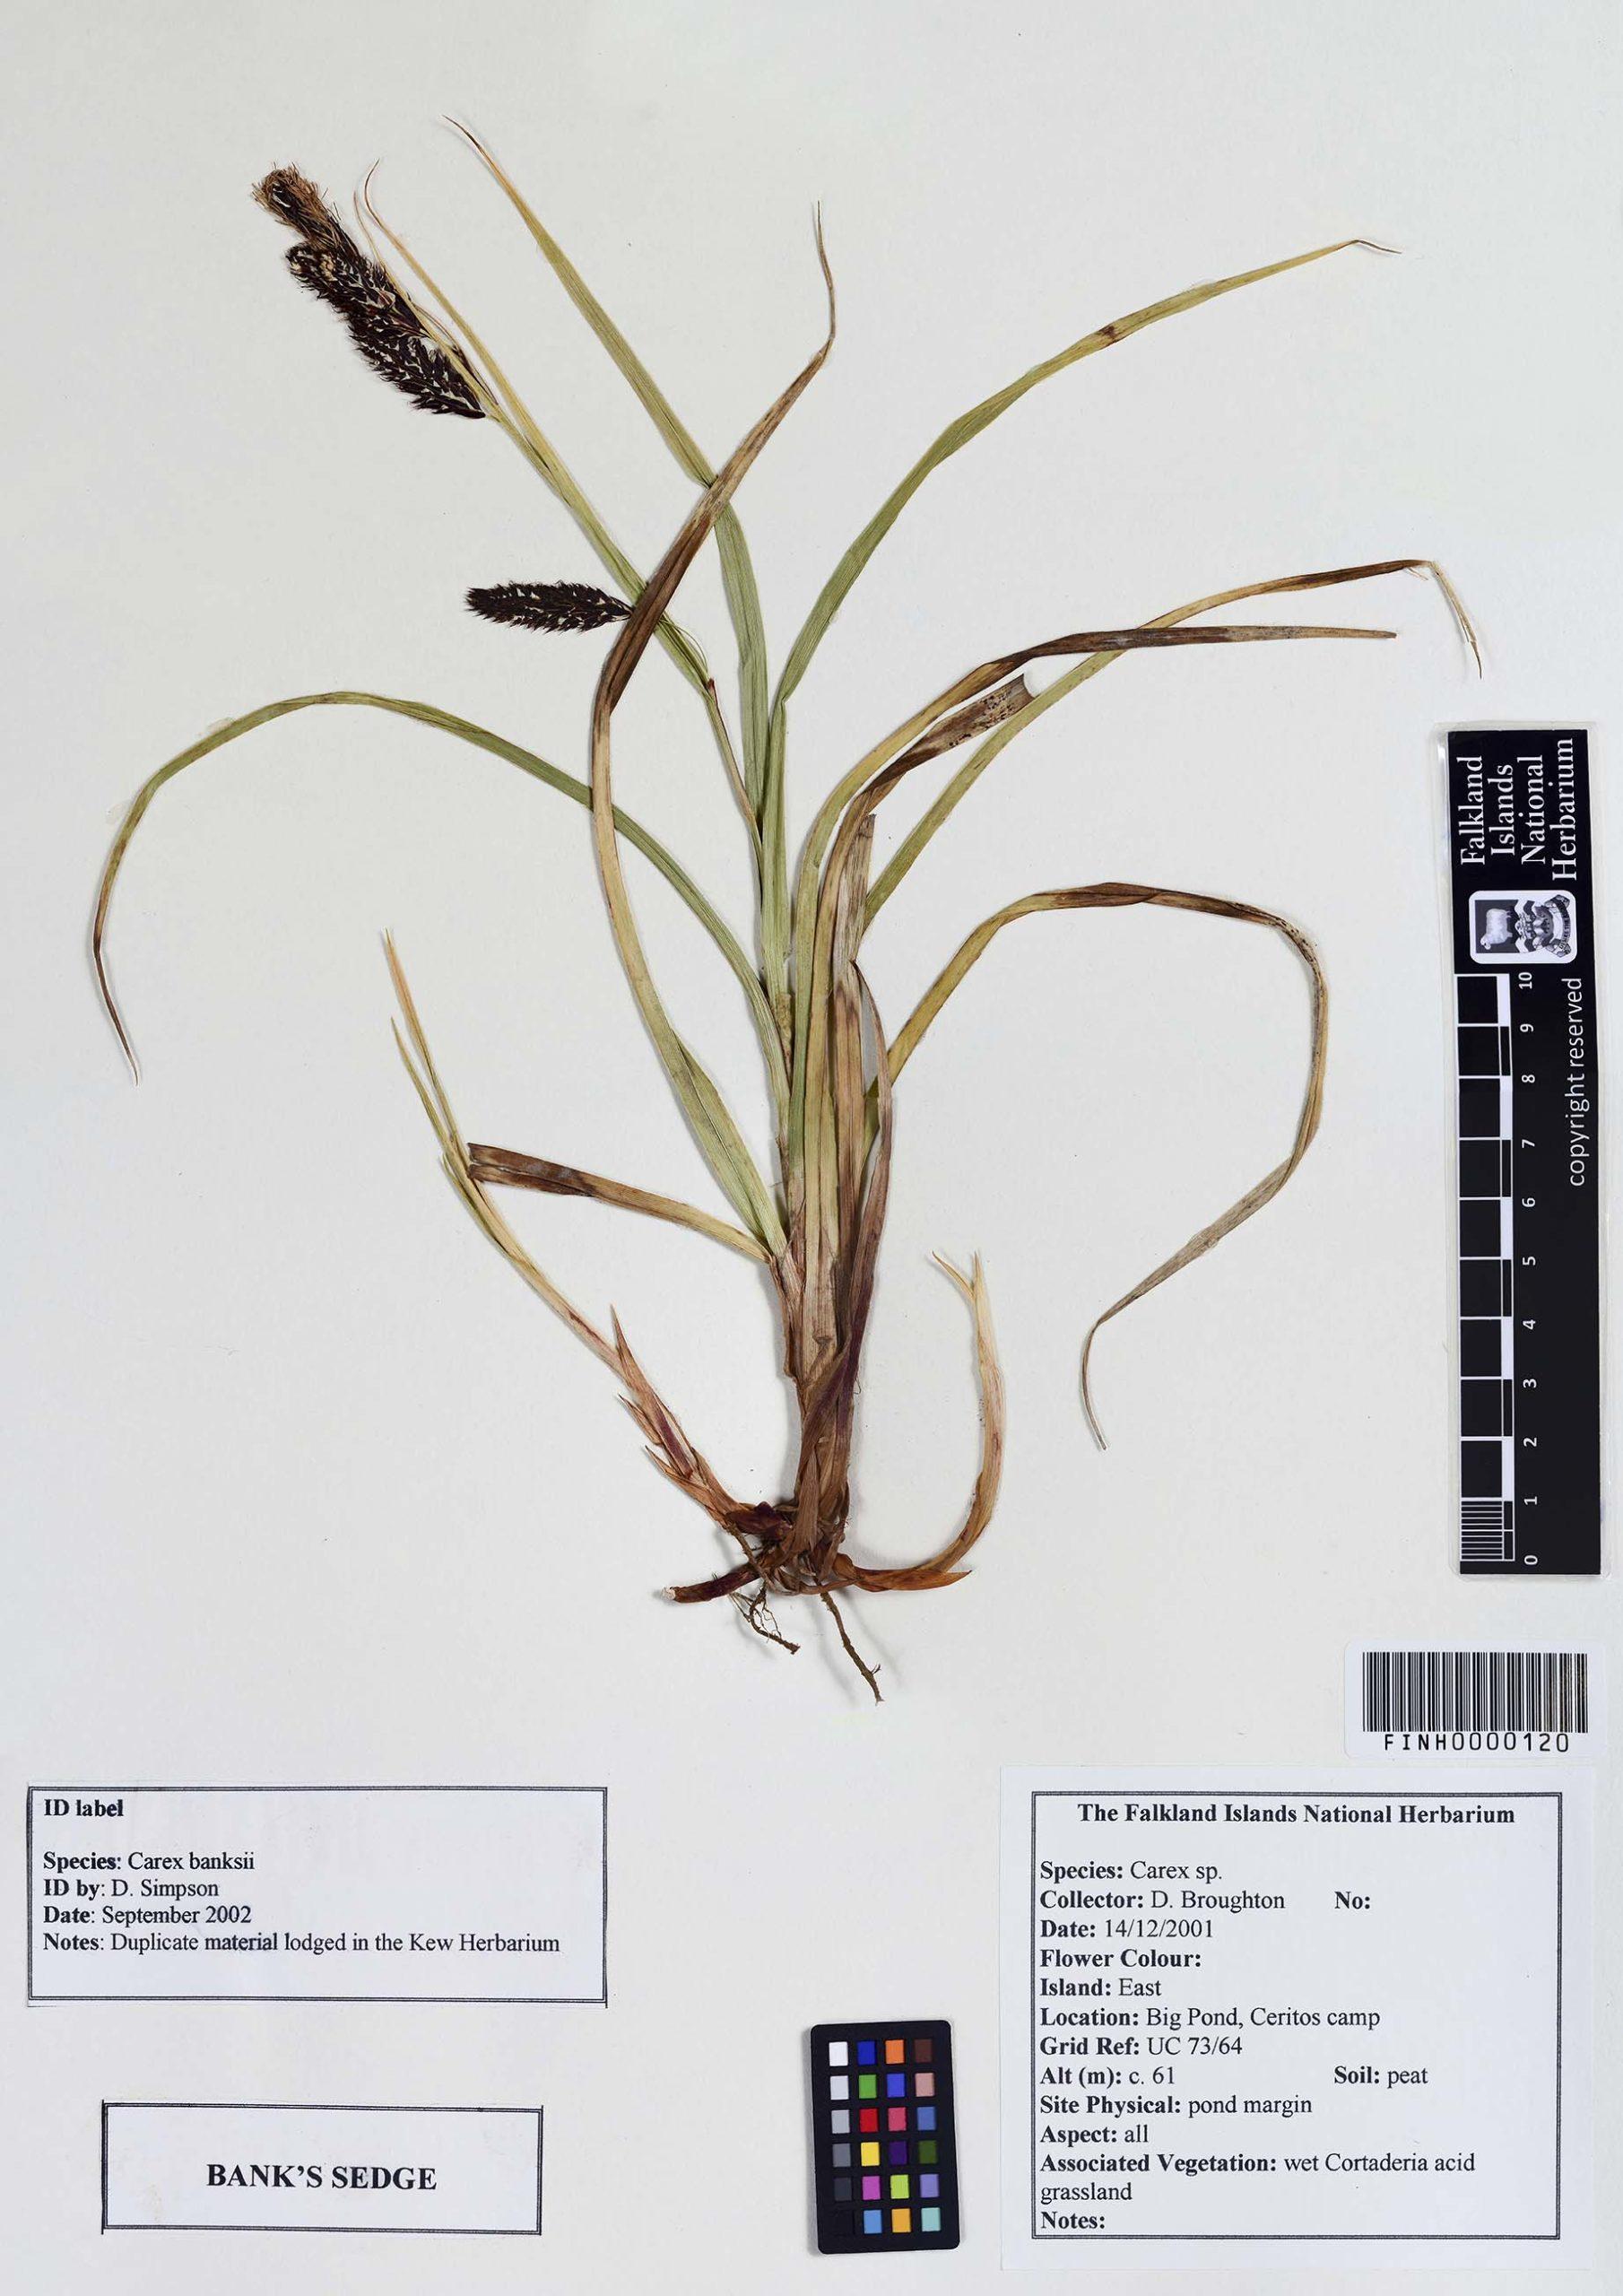 Carex banksii